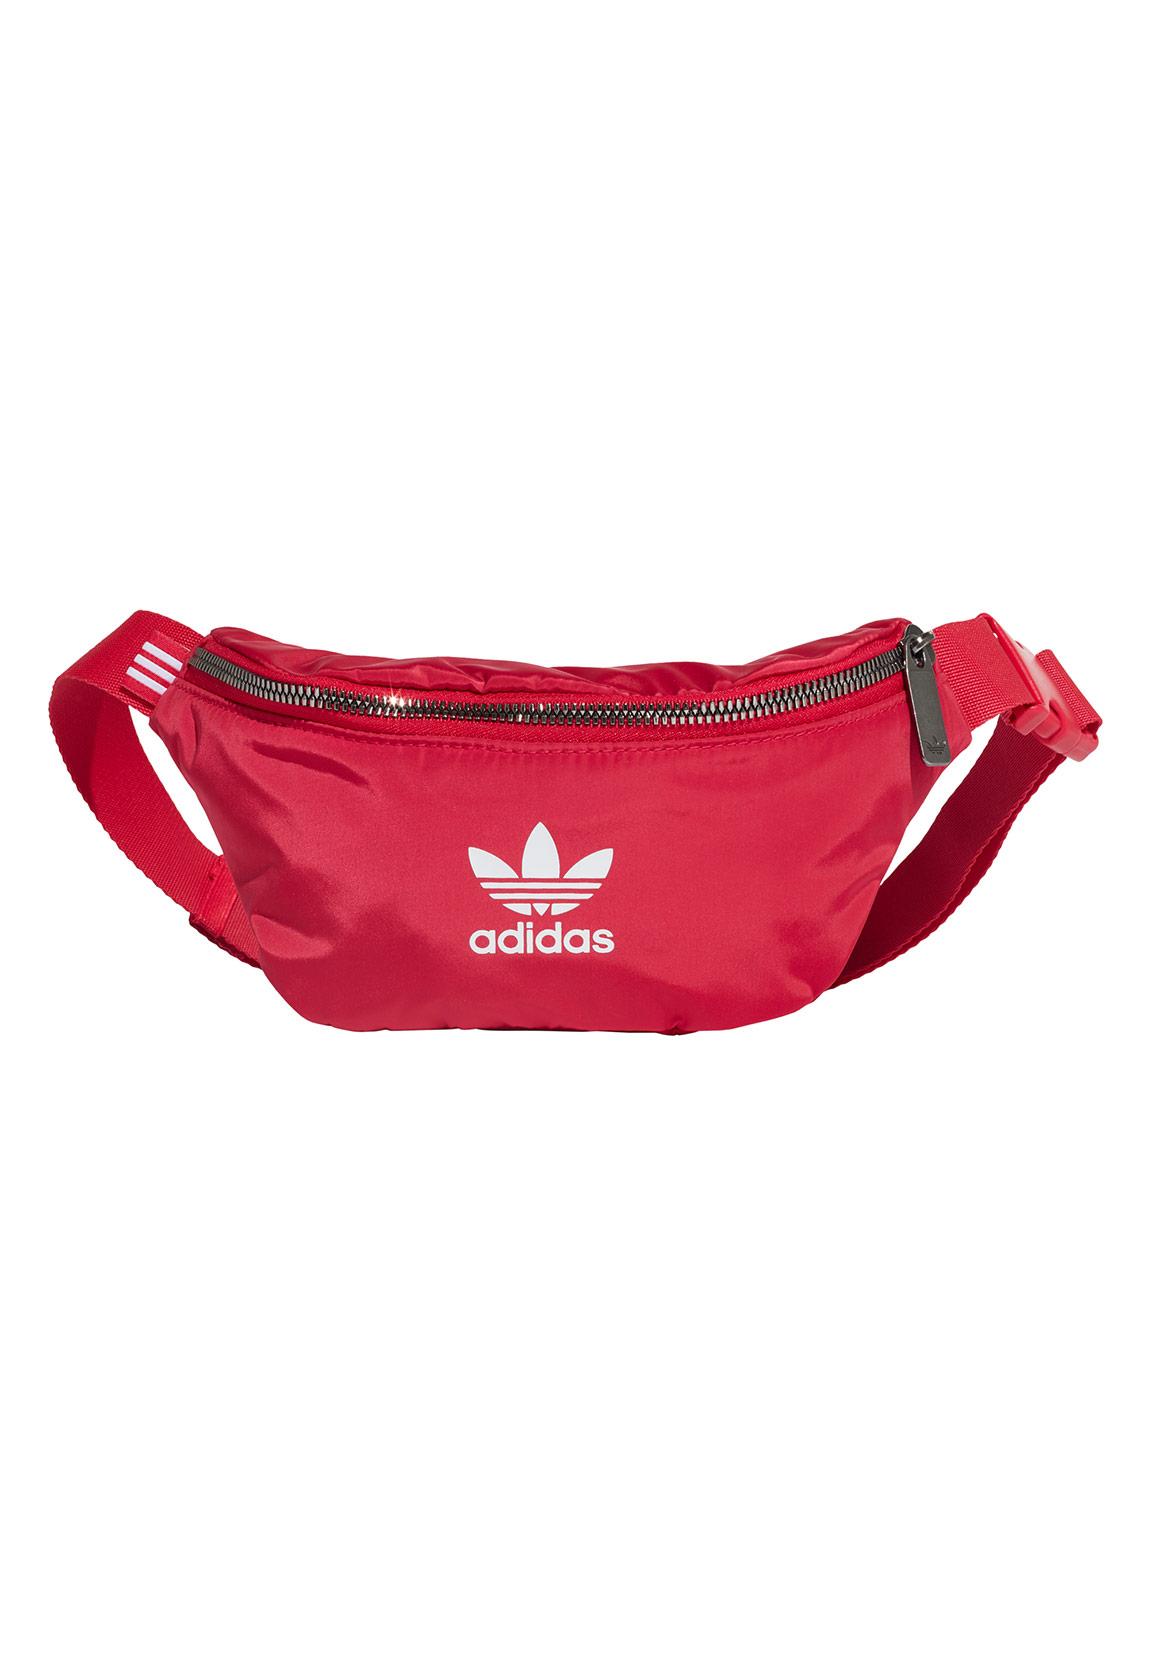 Adidas Originals Bauchtasche WAISTBAG ED5876 Pink